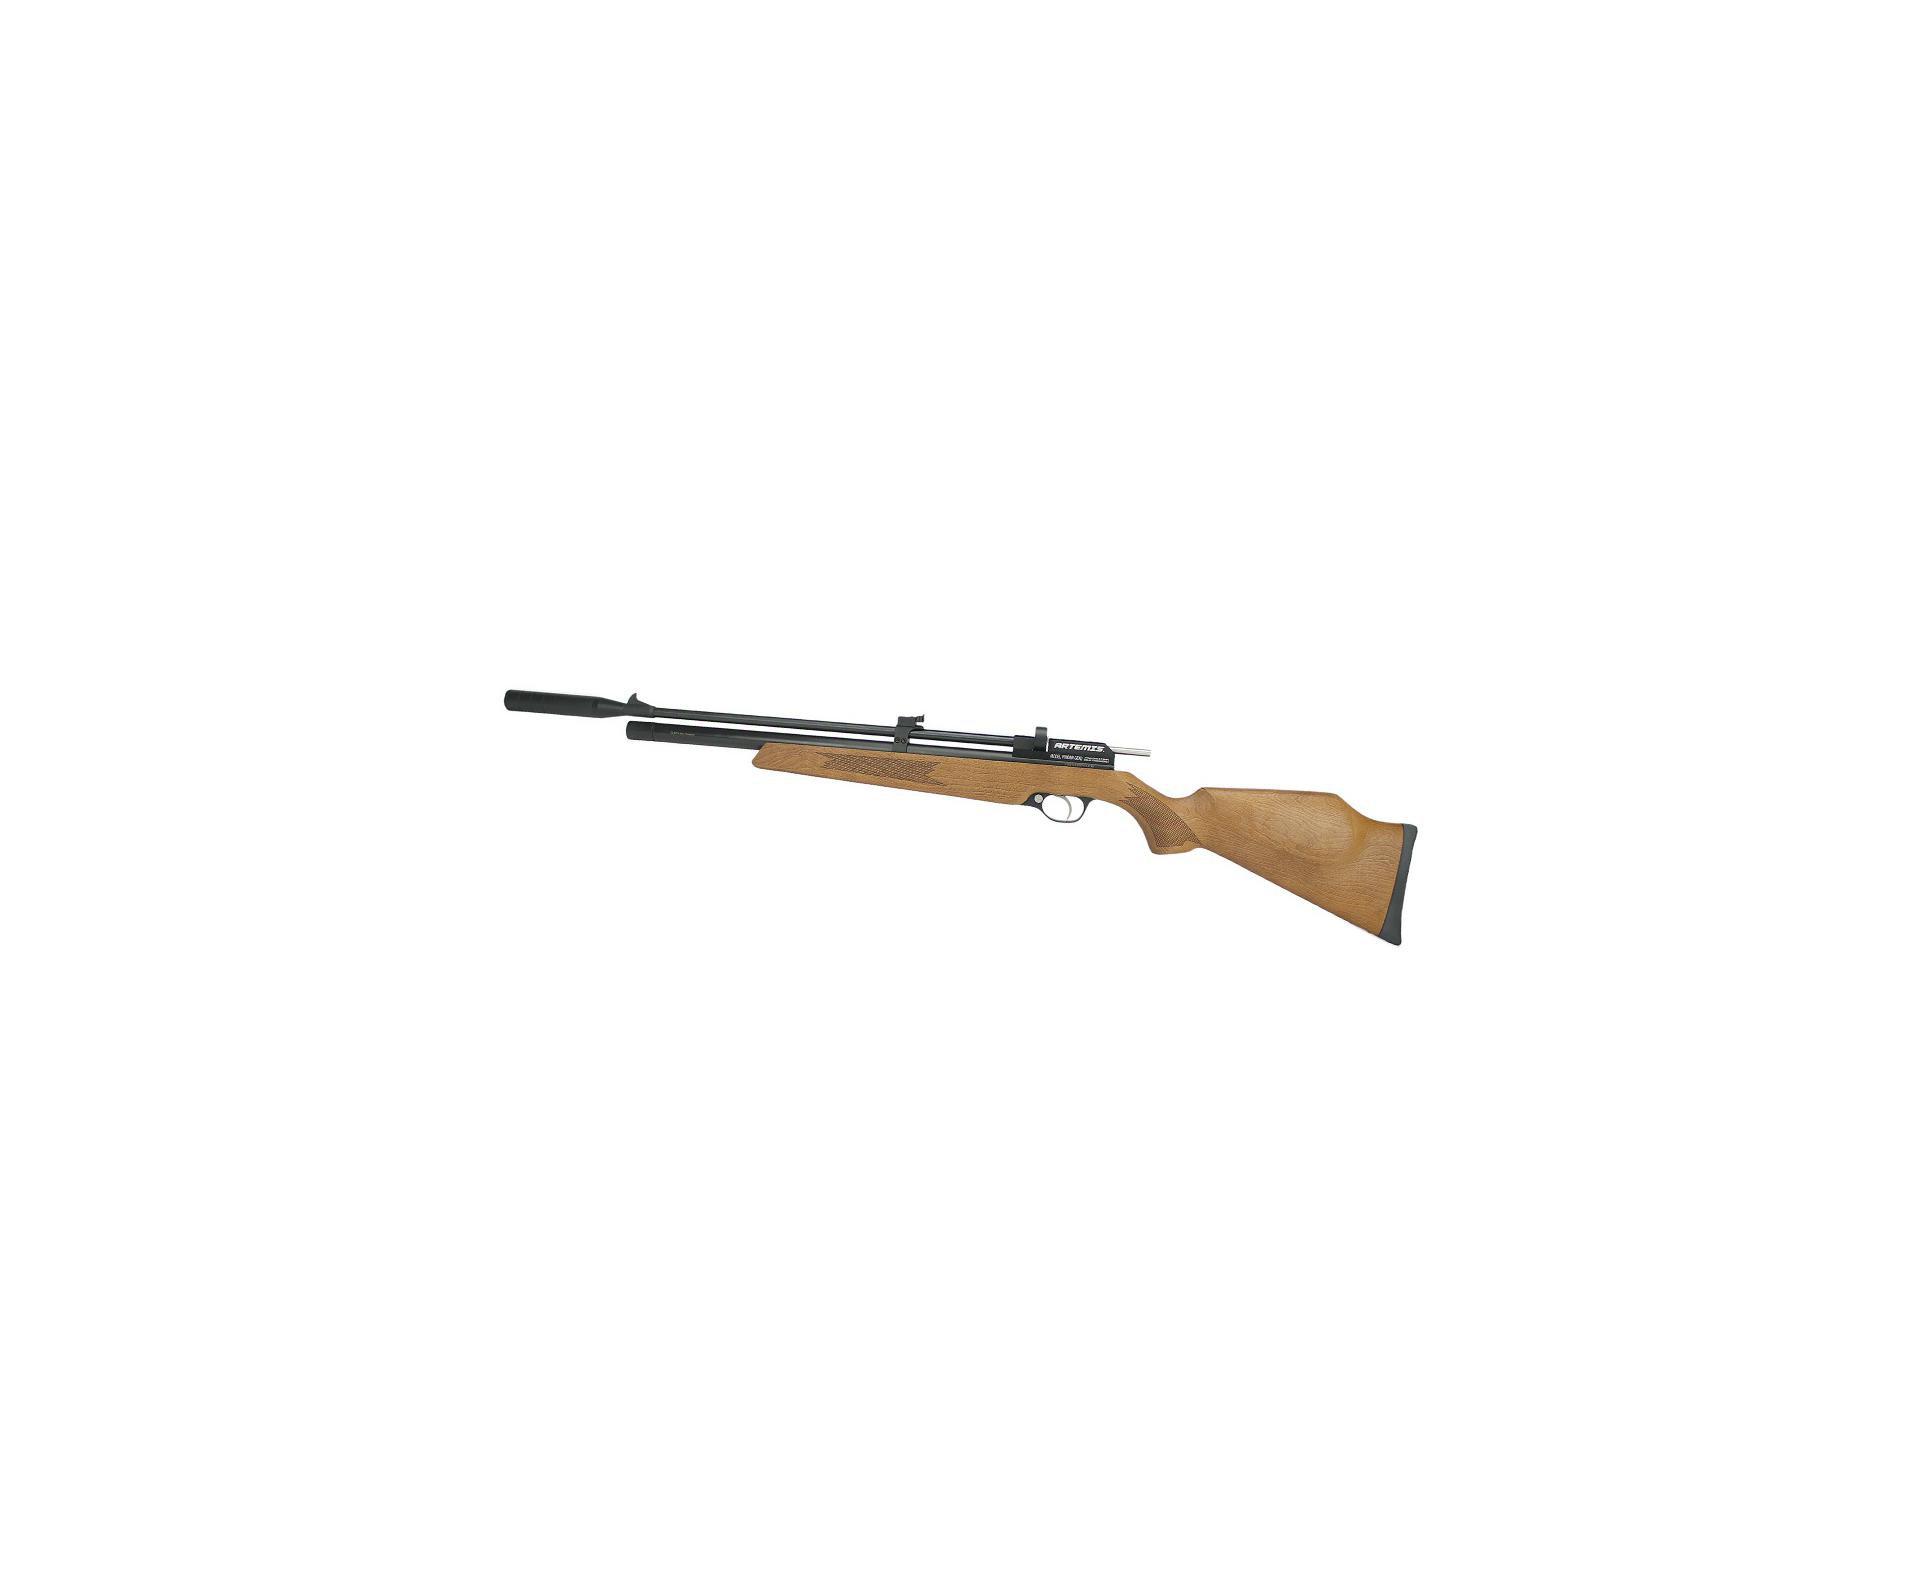 Carabina De Pressão Pcp Pr900w G2 5,5mm New Generation Artemis + Bomba Manual + Capa